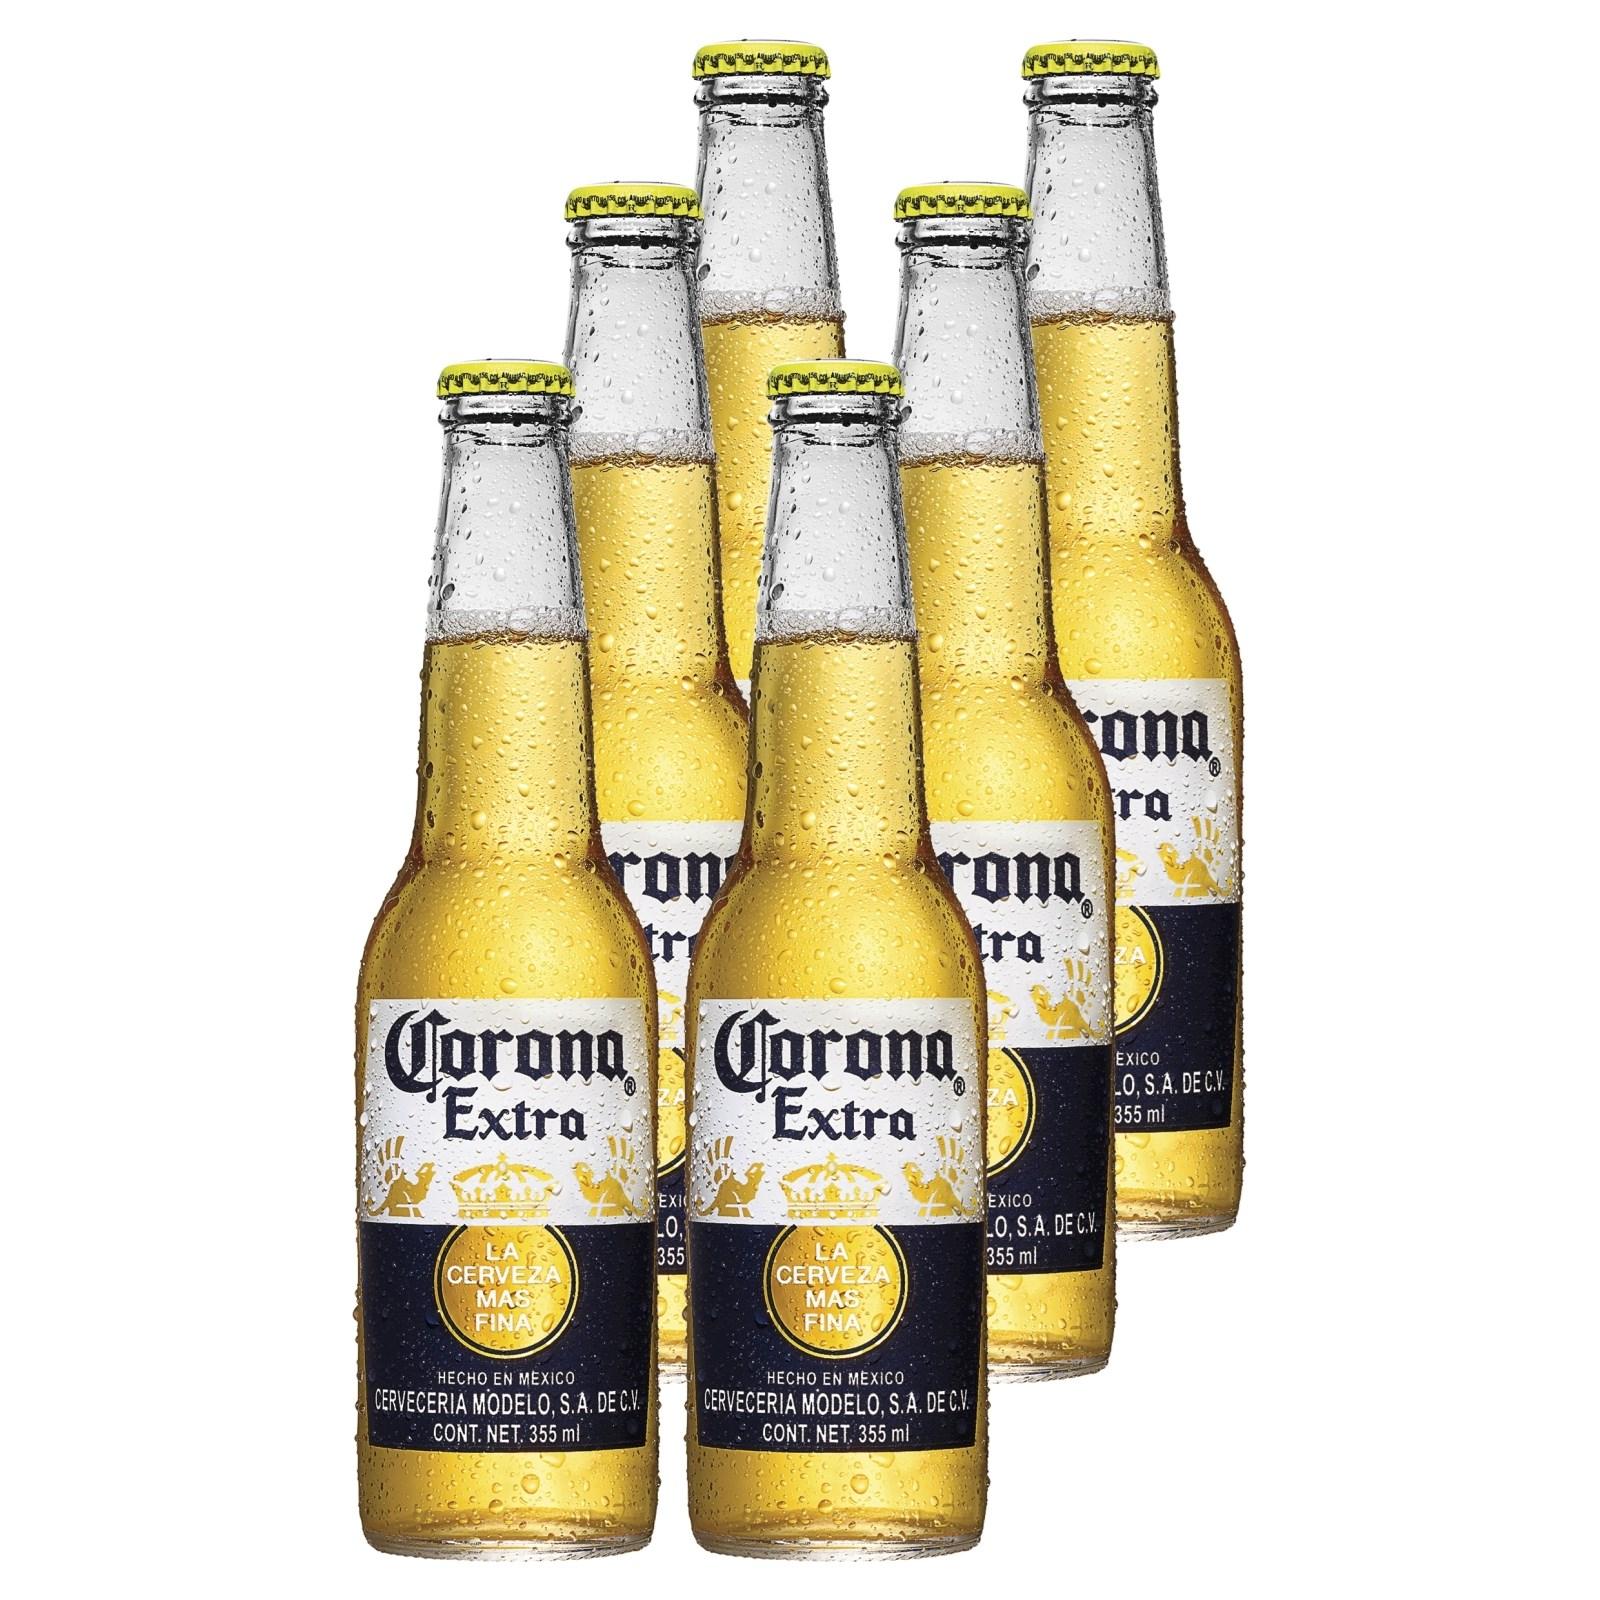 Corona (Bier)